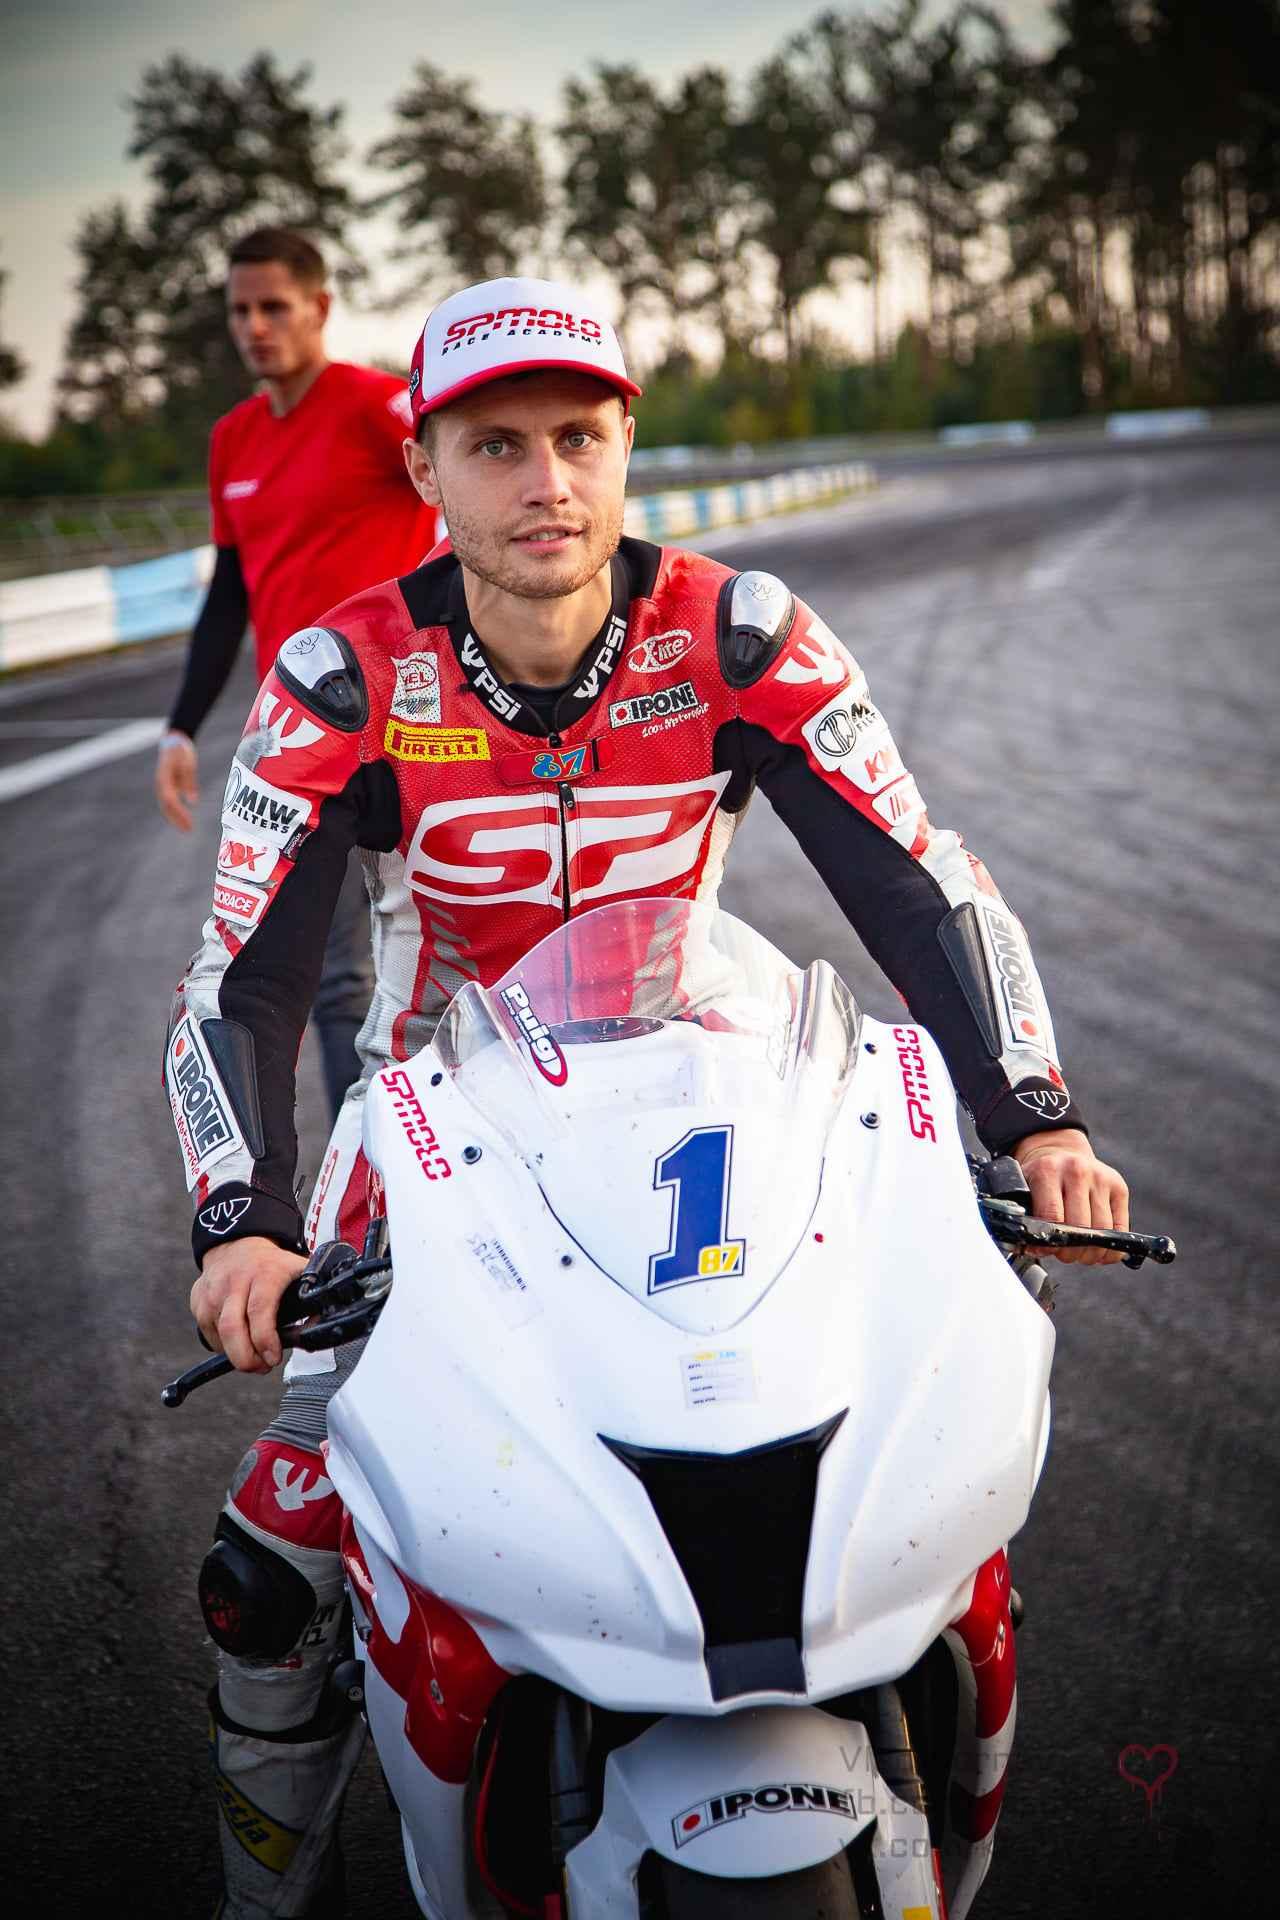 5-6_etap_MotoGPUkraine_118